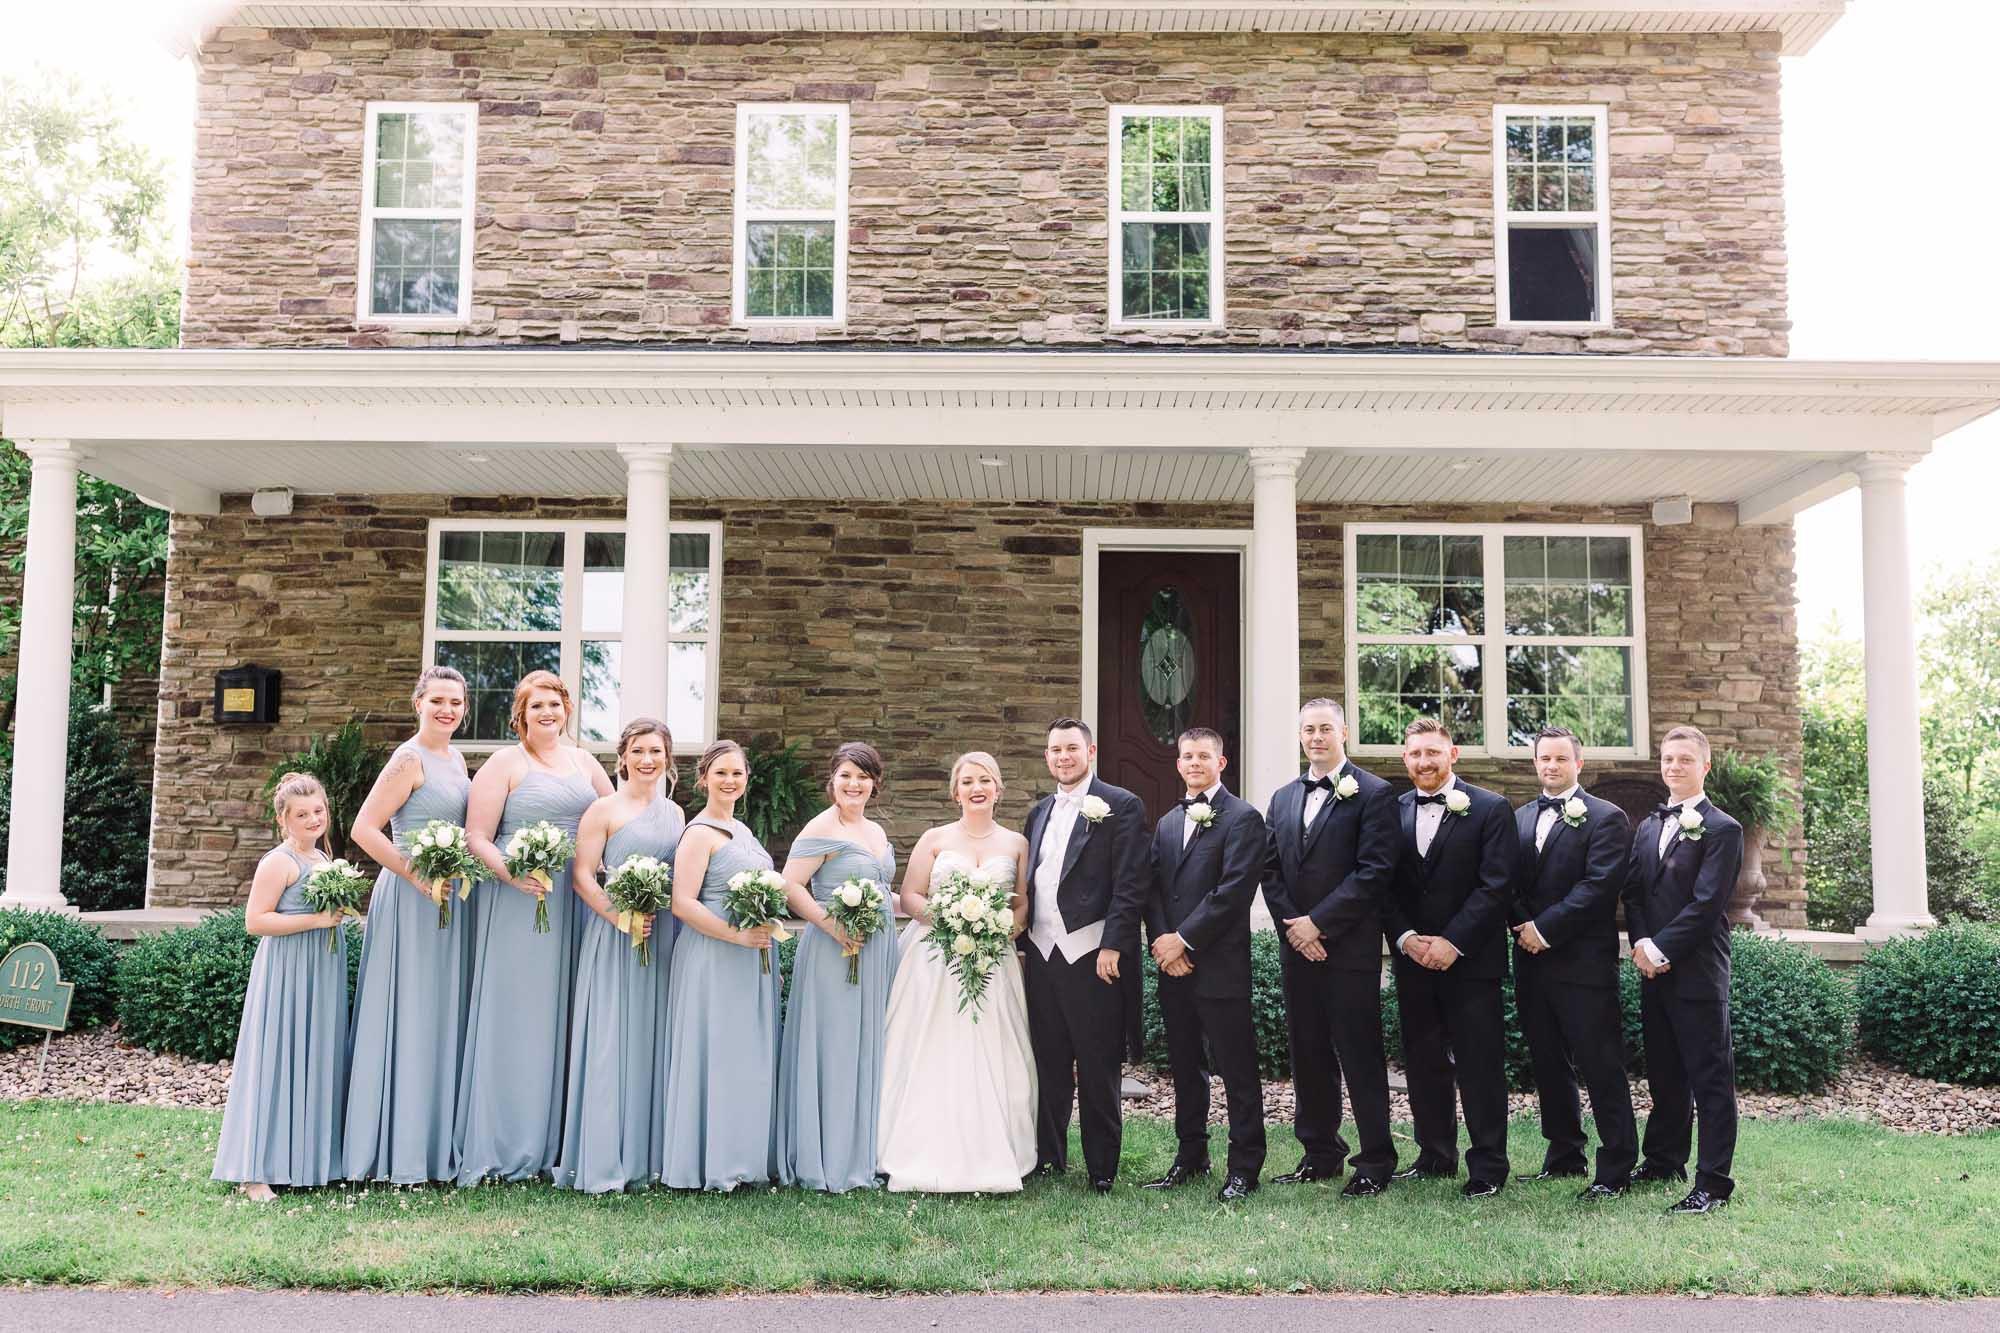 isle-of-que-wedding-6794.jpg